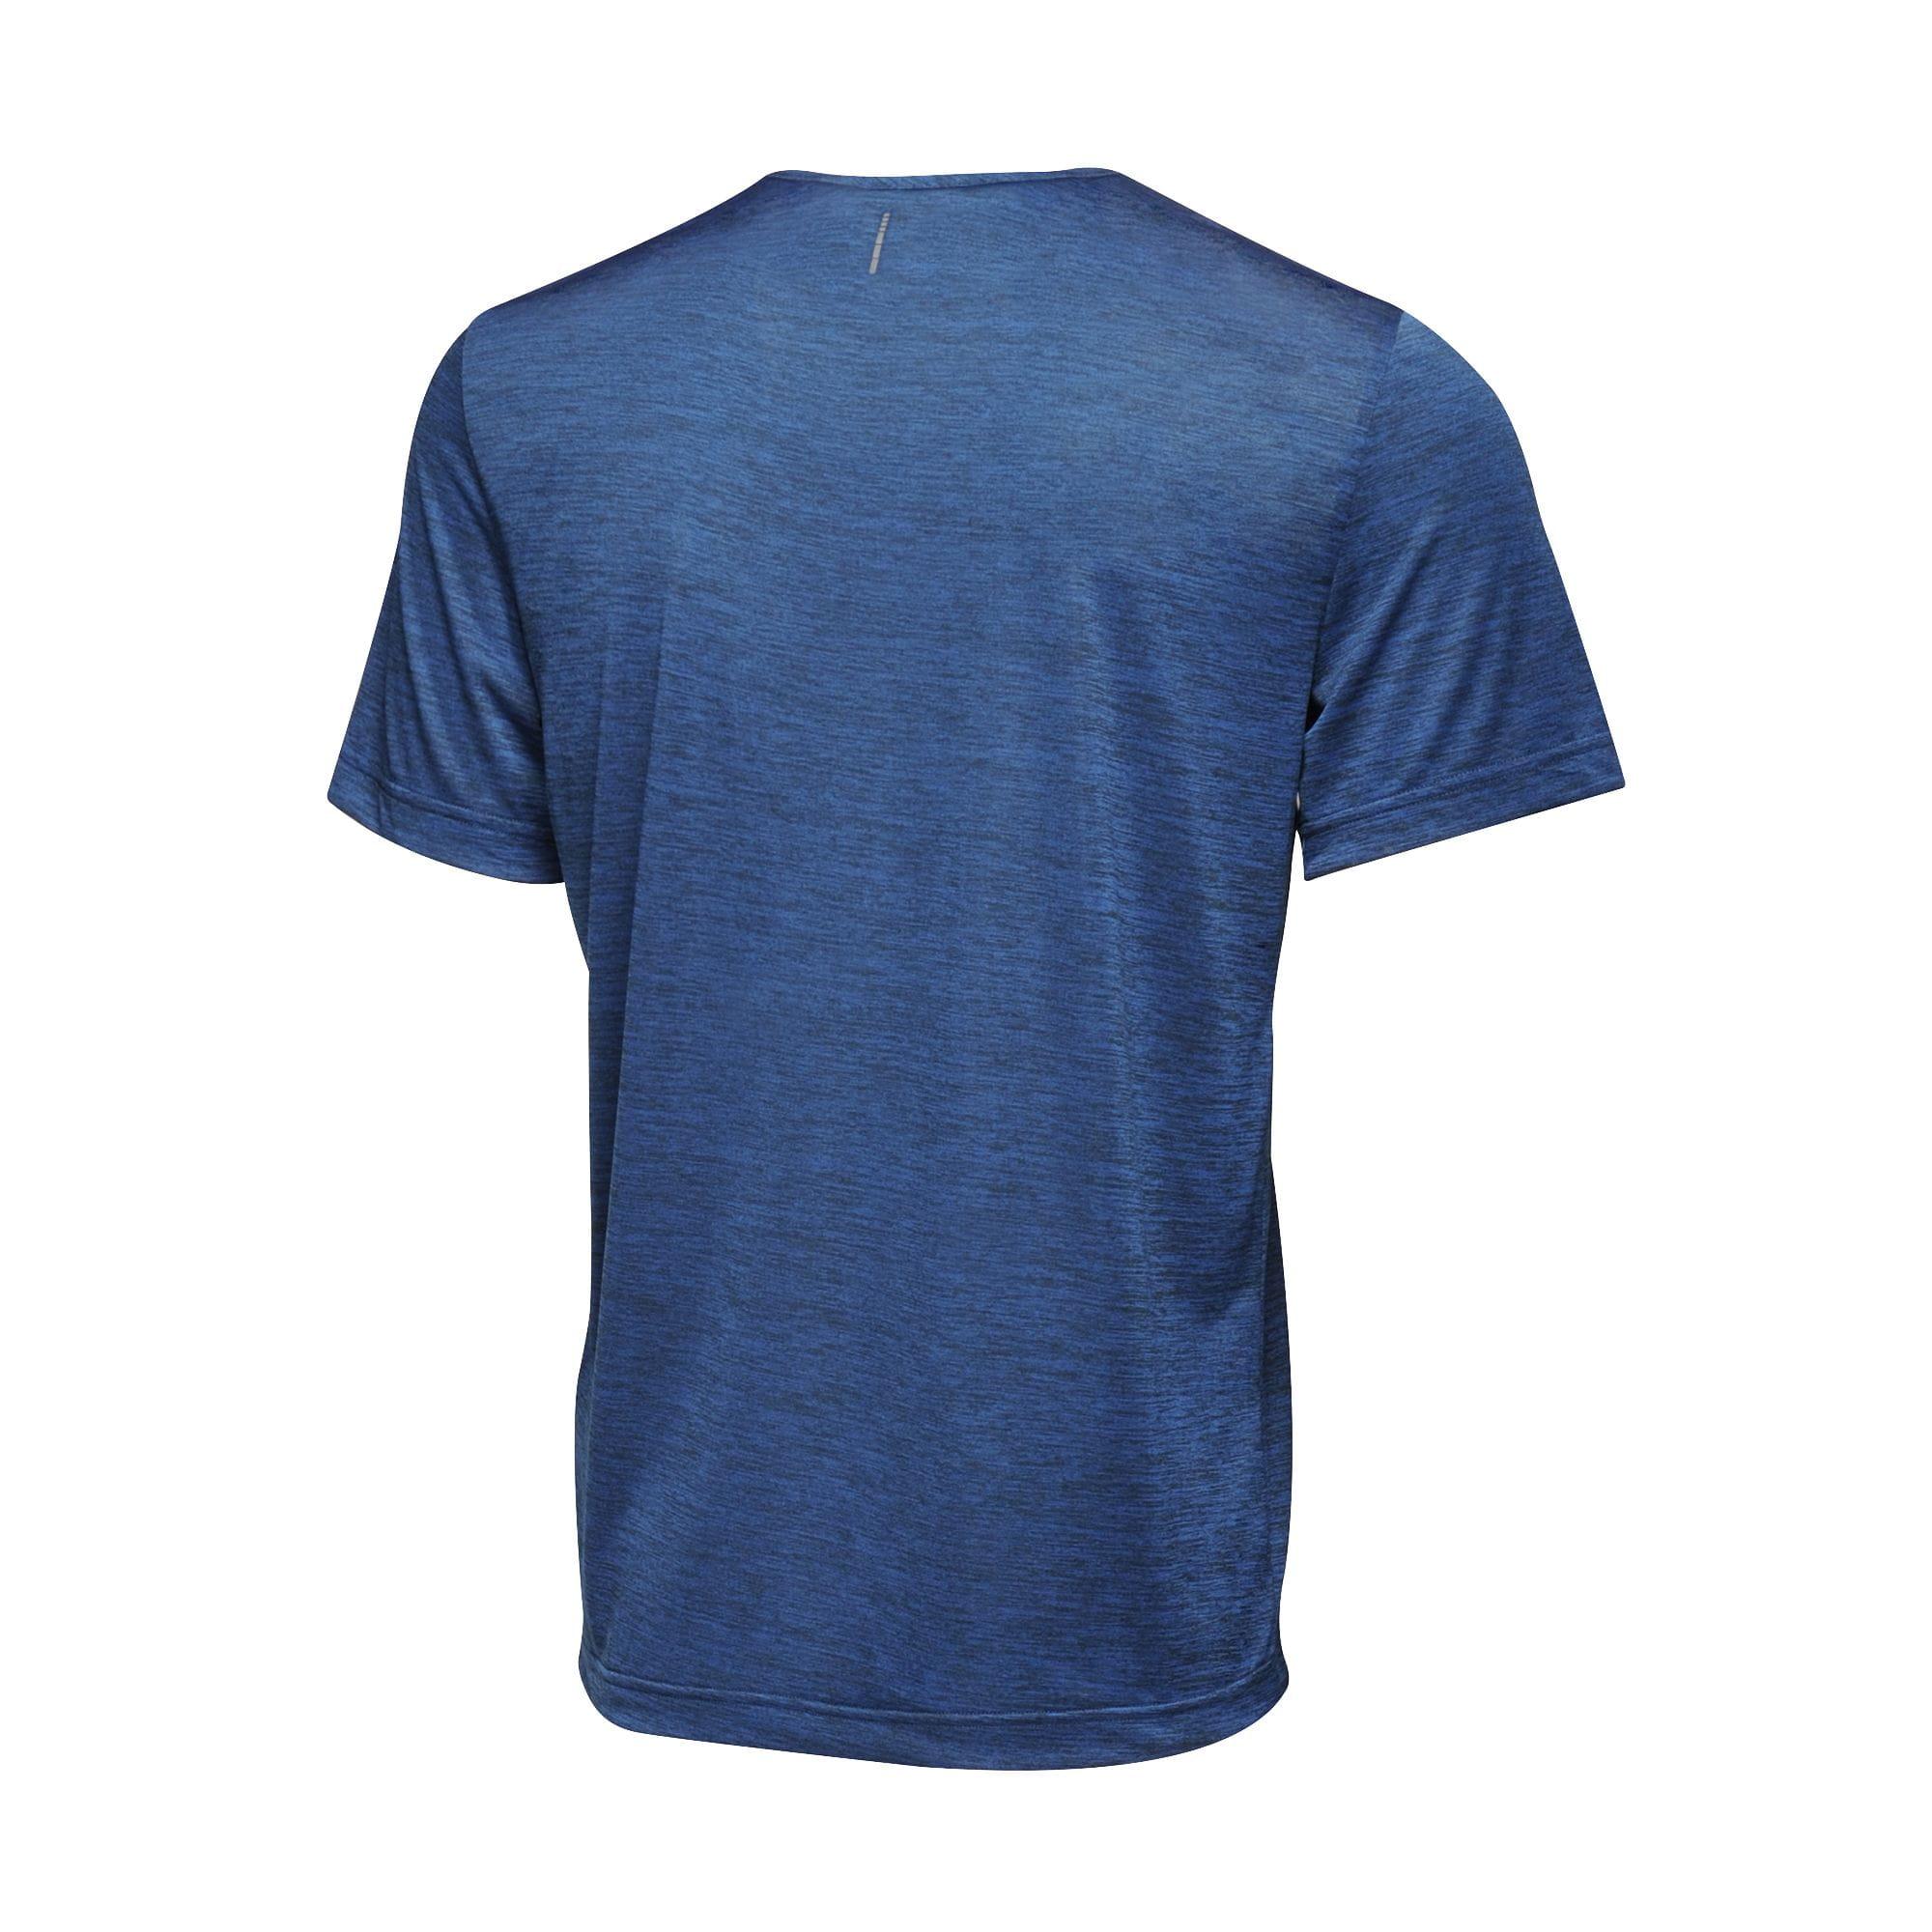 Regatta Mens Antwerp Short Sleeve Marl T-Shirt (L) (Black)